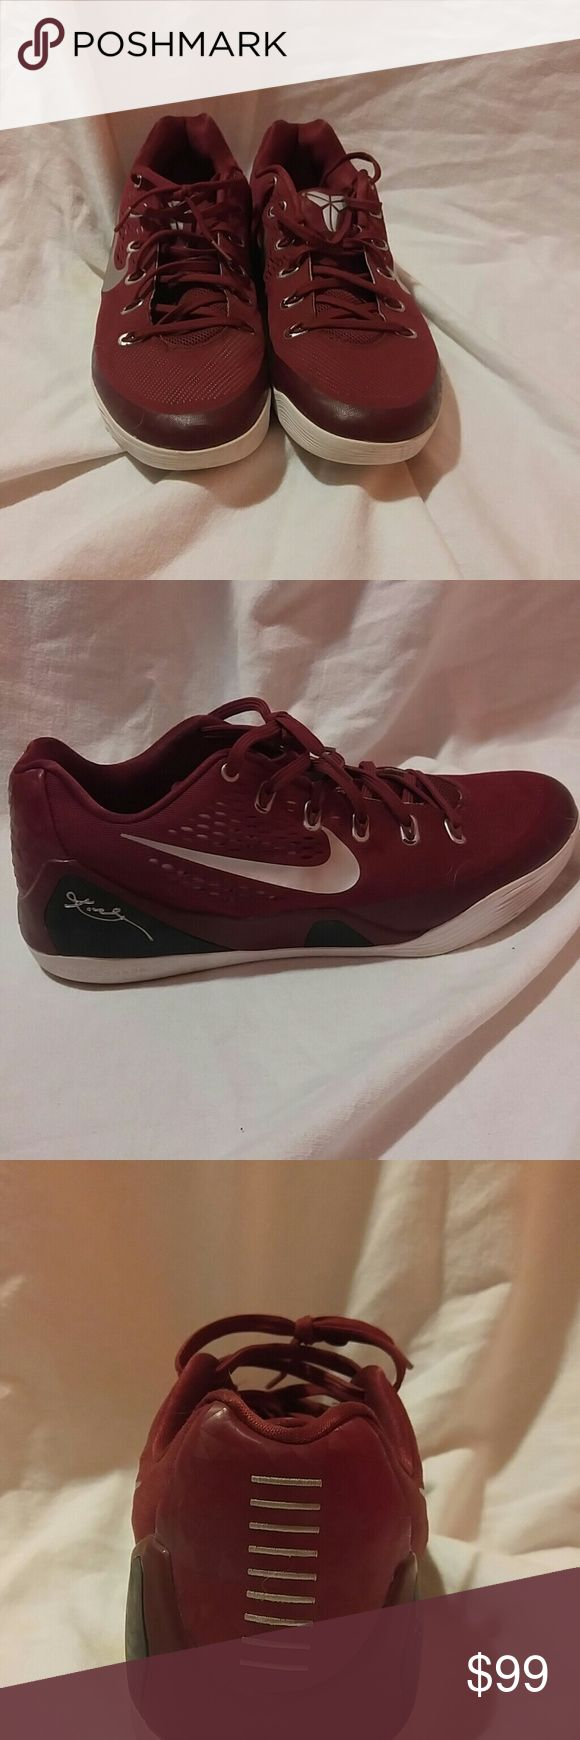 Nike Kobe 9 Maron Size 14 Nike basketbal Nike Shoes Sneakers